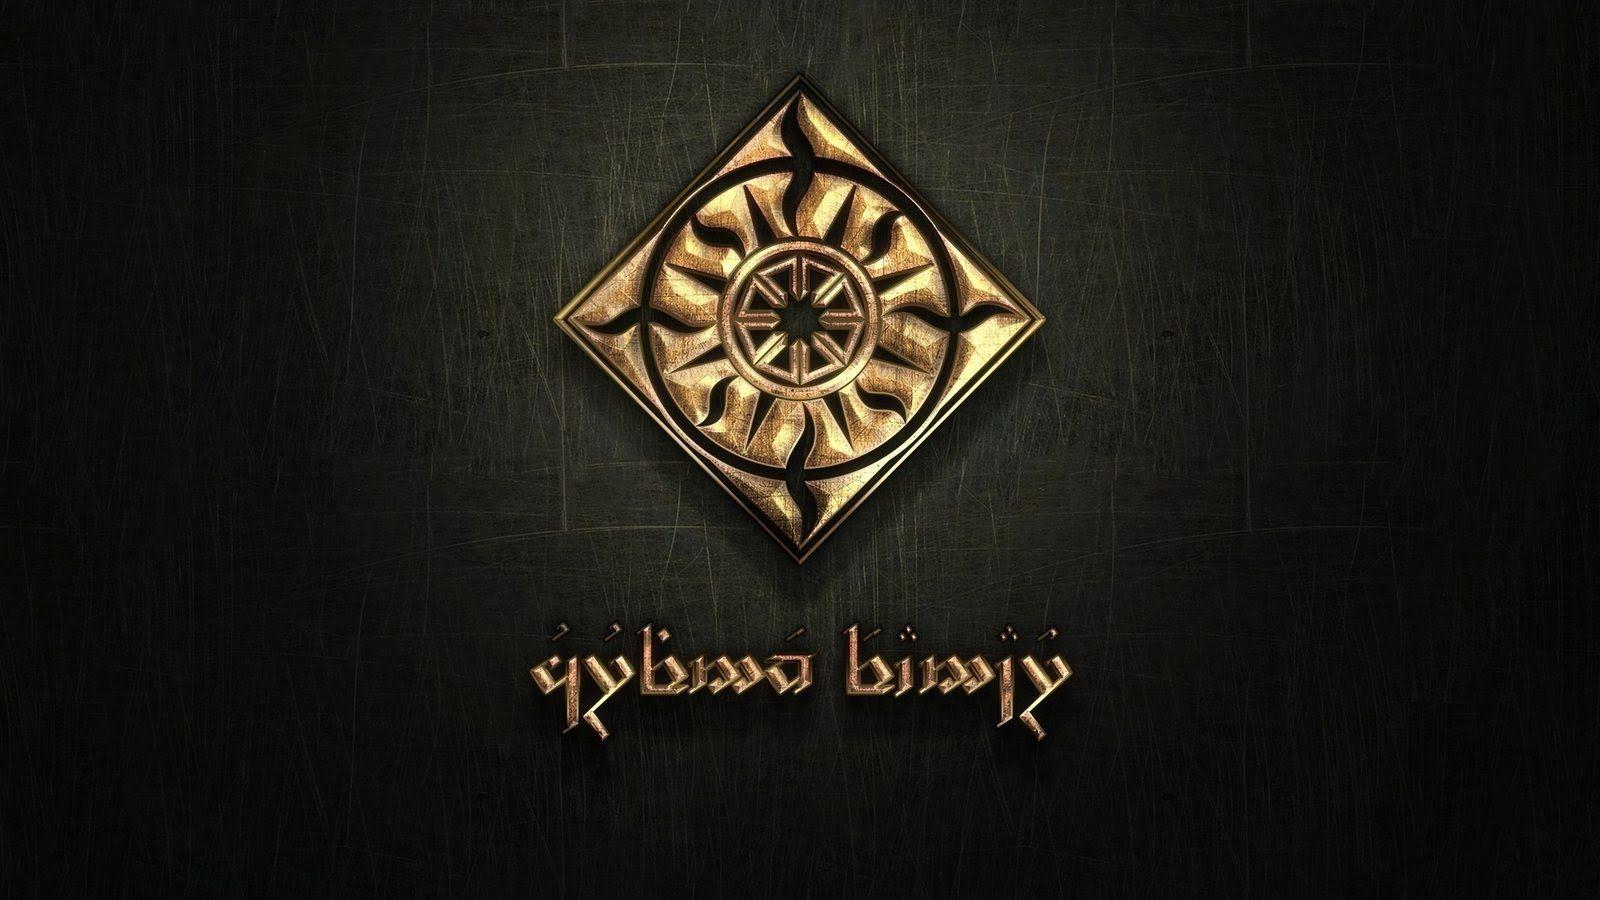 The Silmarillion Trailer [HD] Book of shadows, The